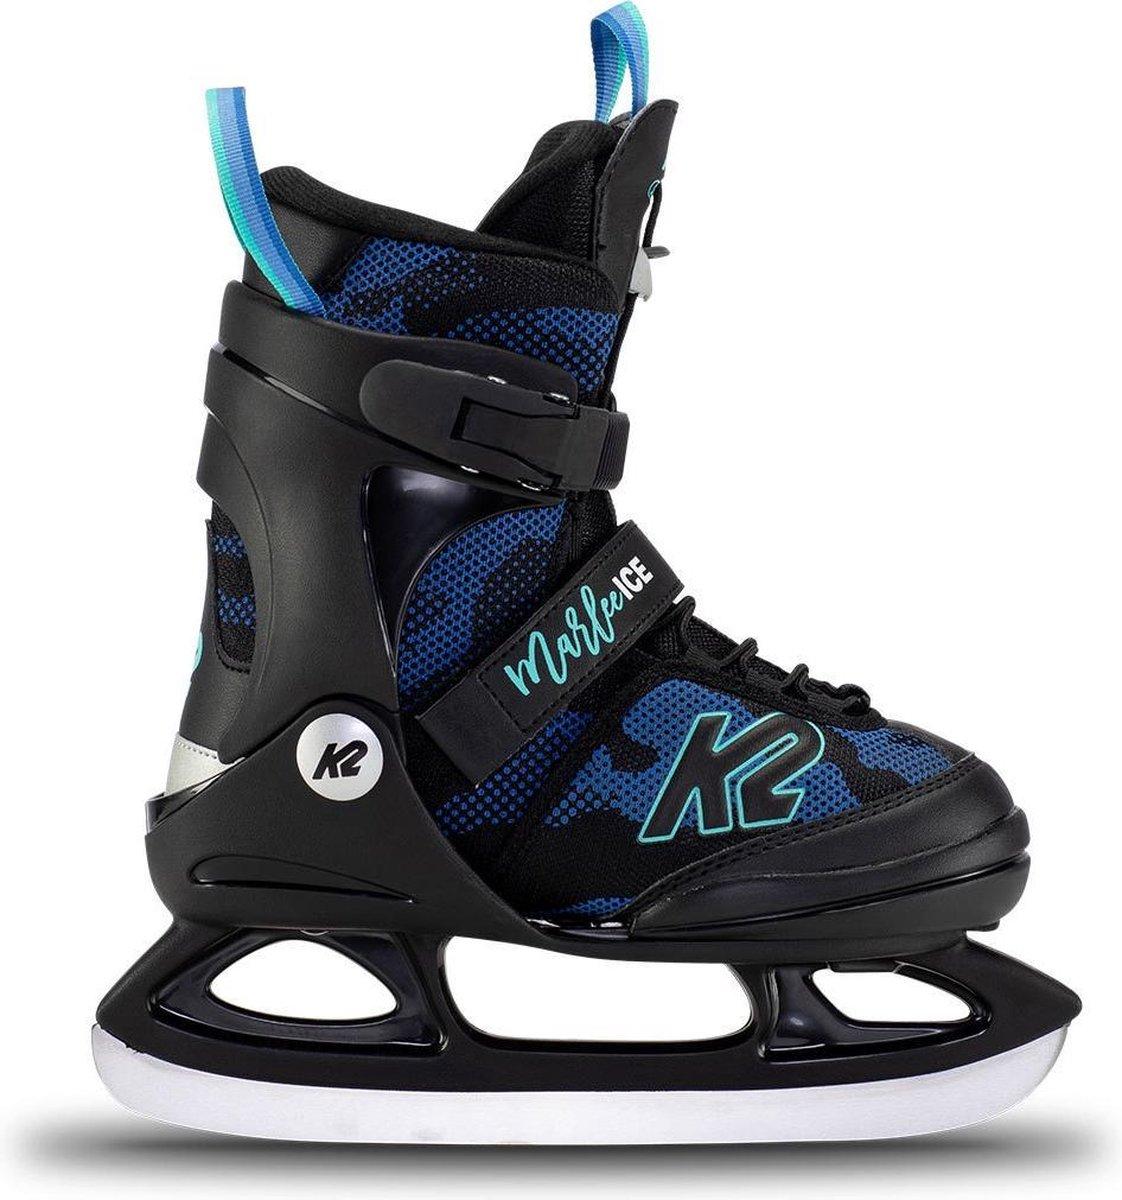 K2 Marlee Ice Girl's